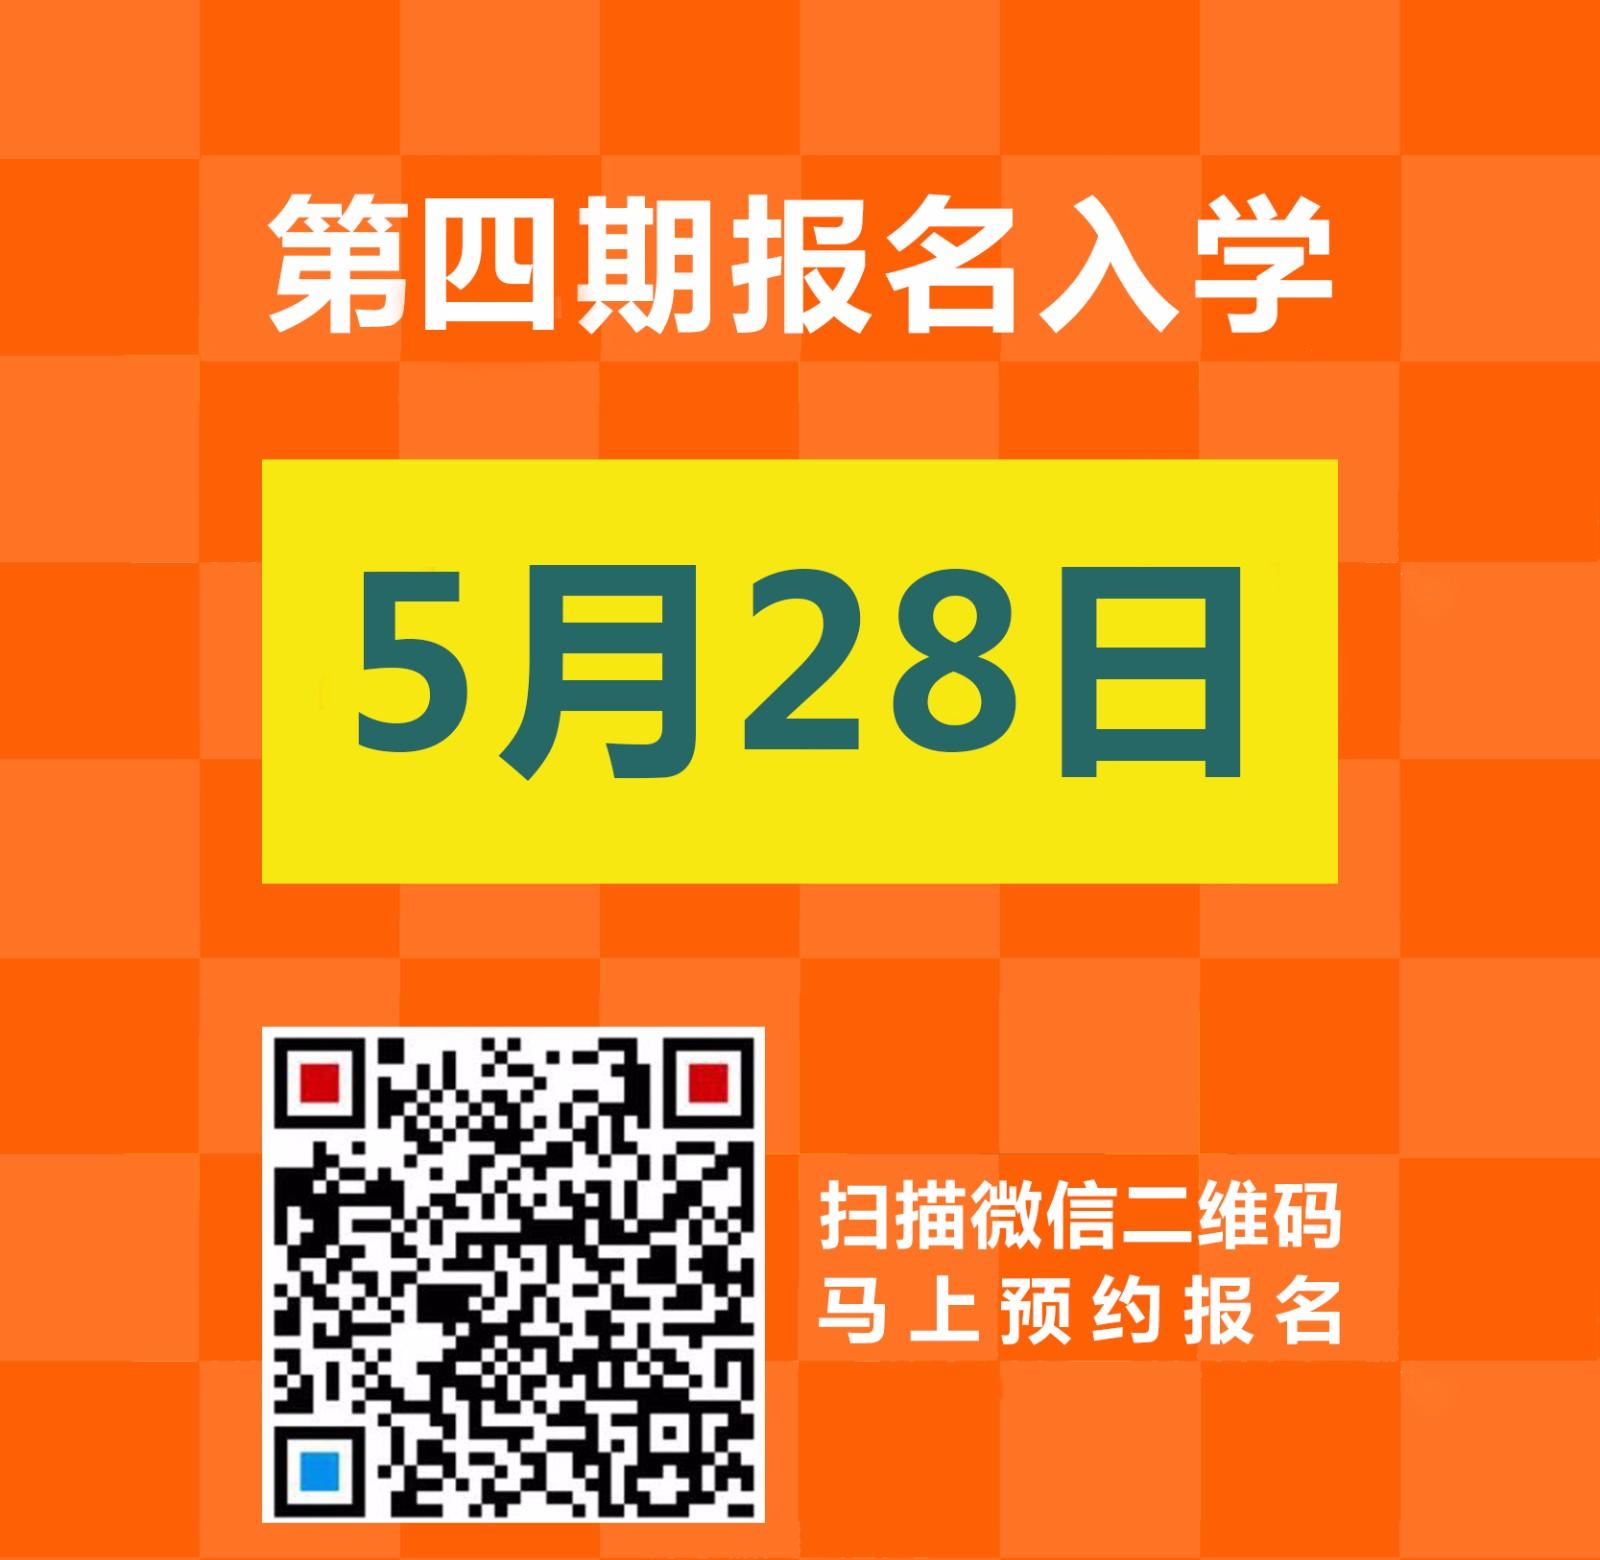 1526459941583749tufp.jpg